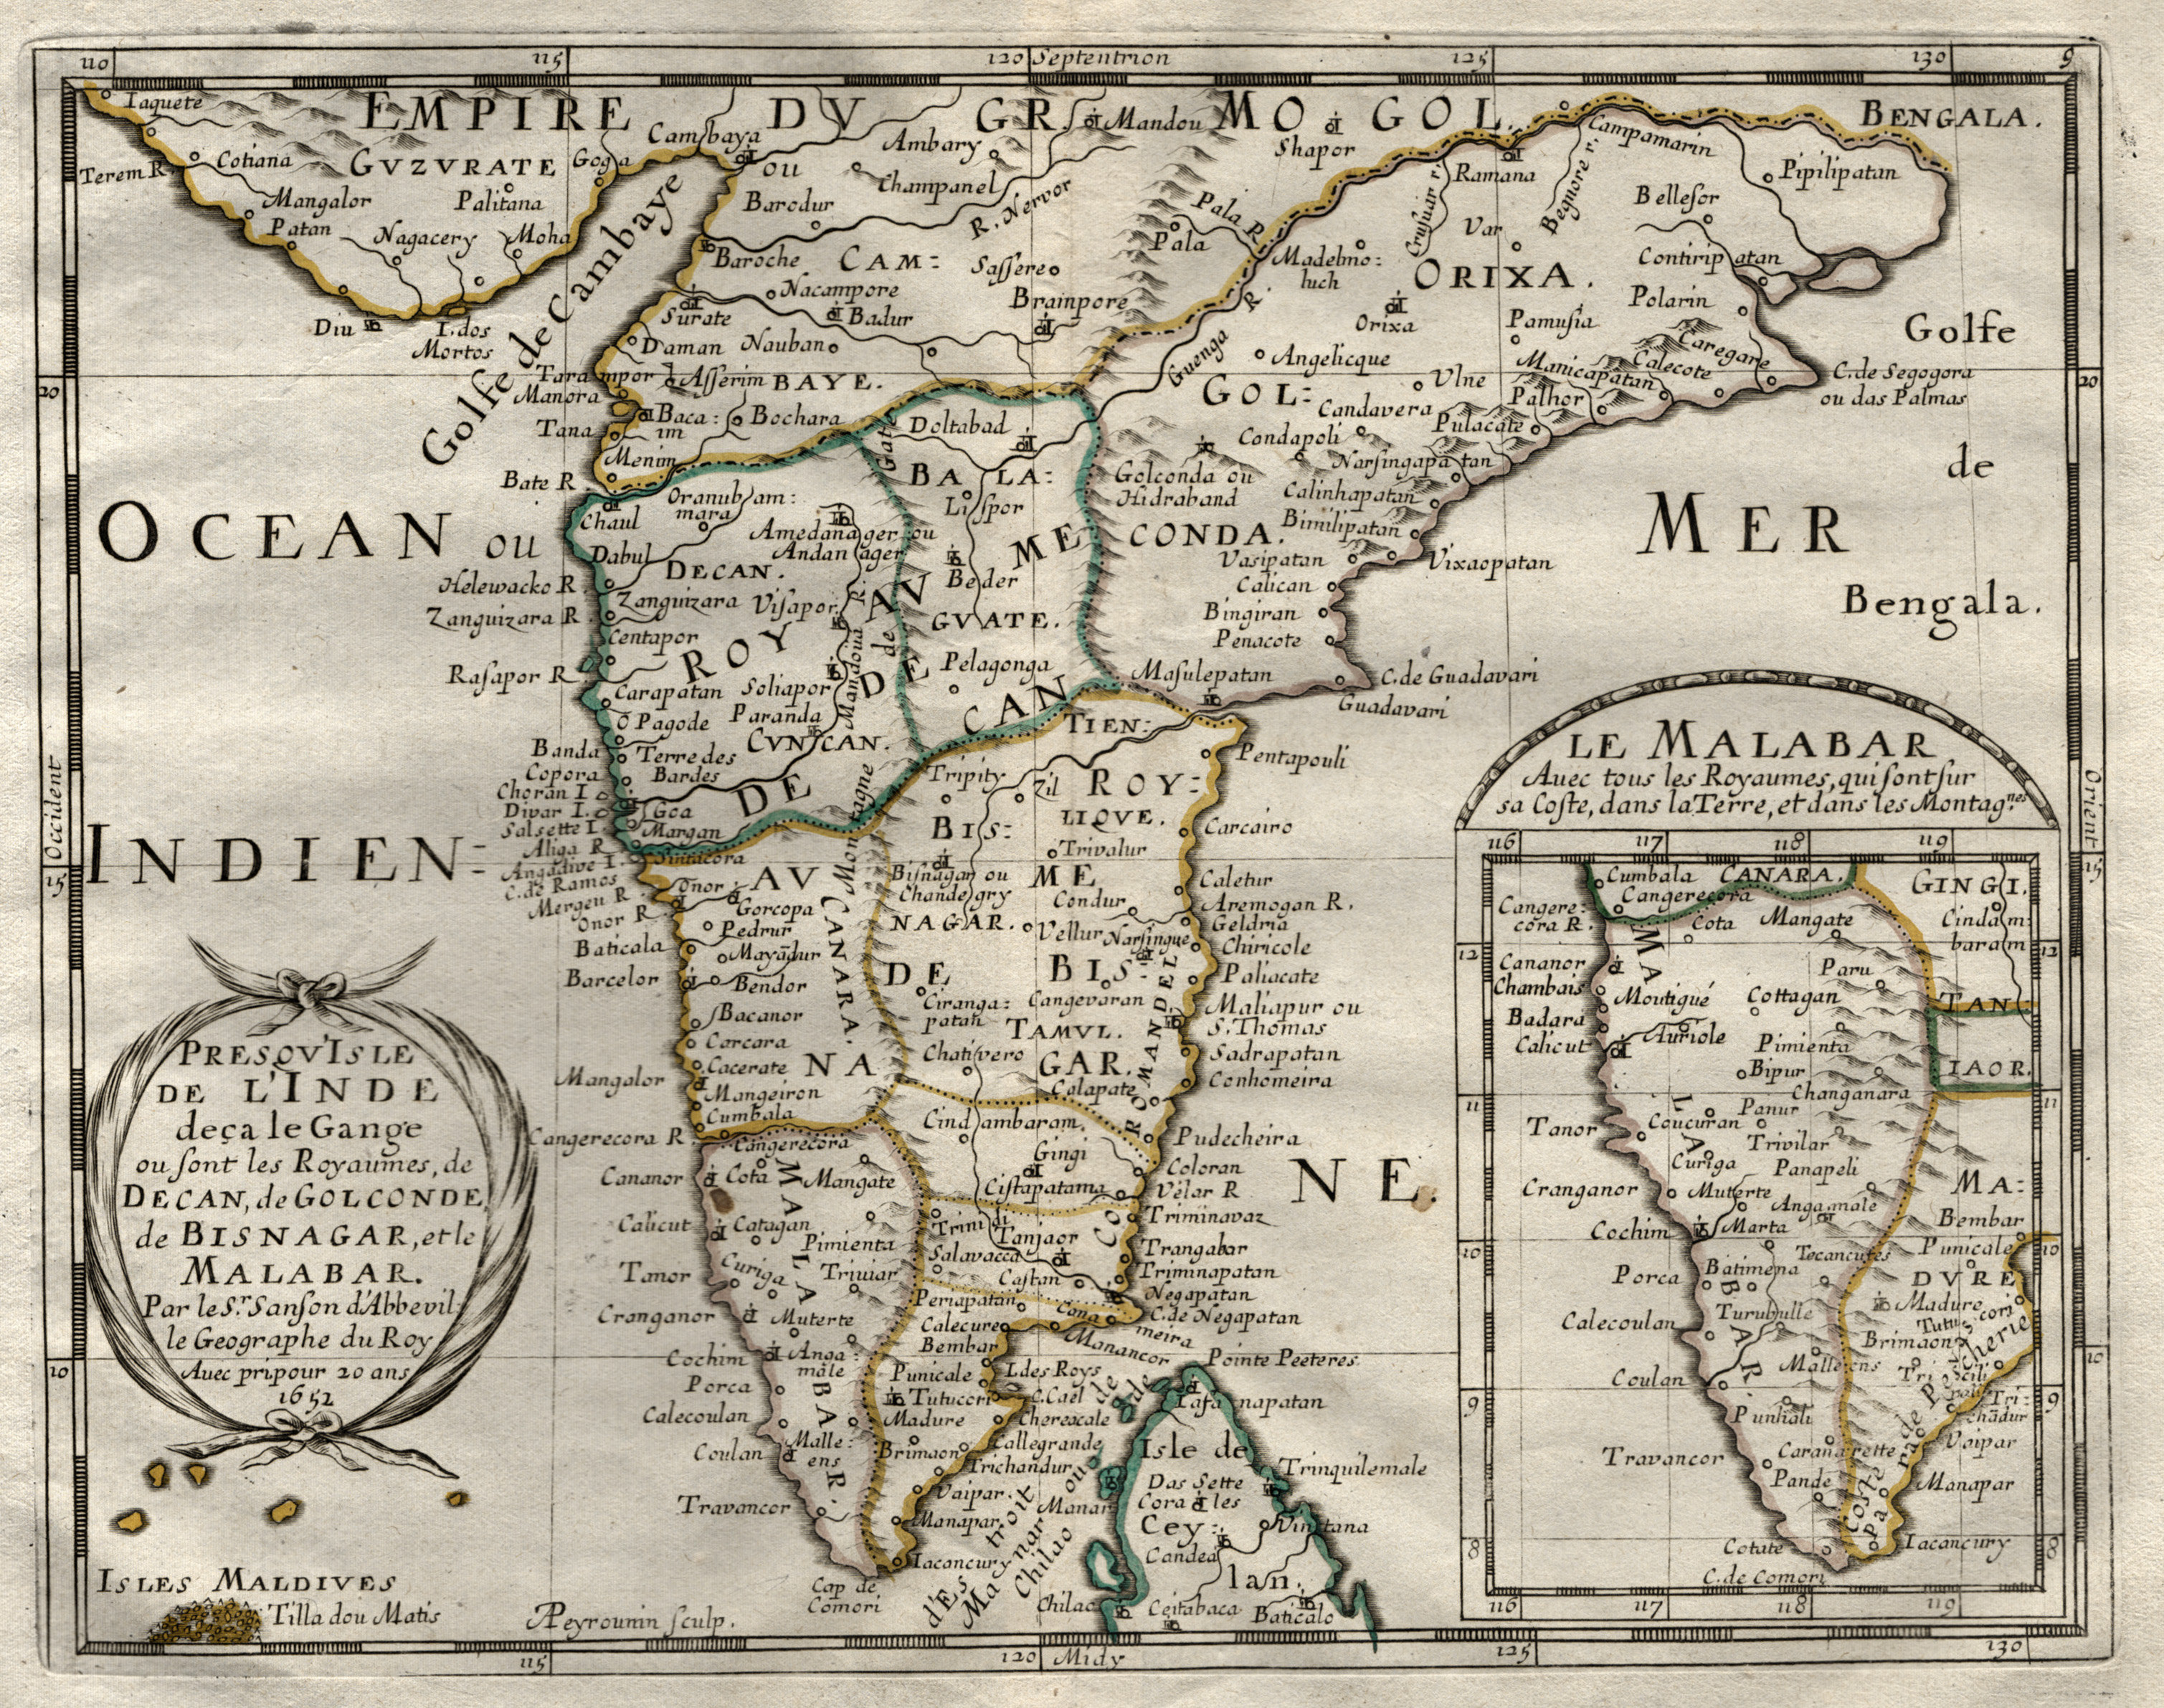 Kst.- Karte, v. A. Peyrounin b N.: Indien ( India